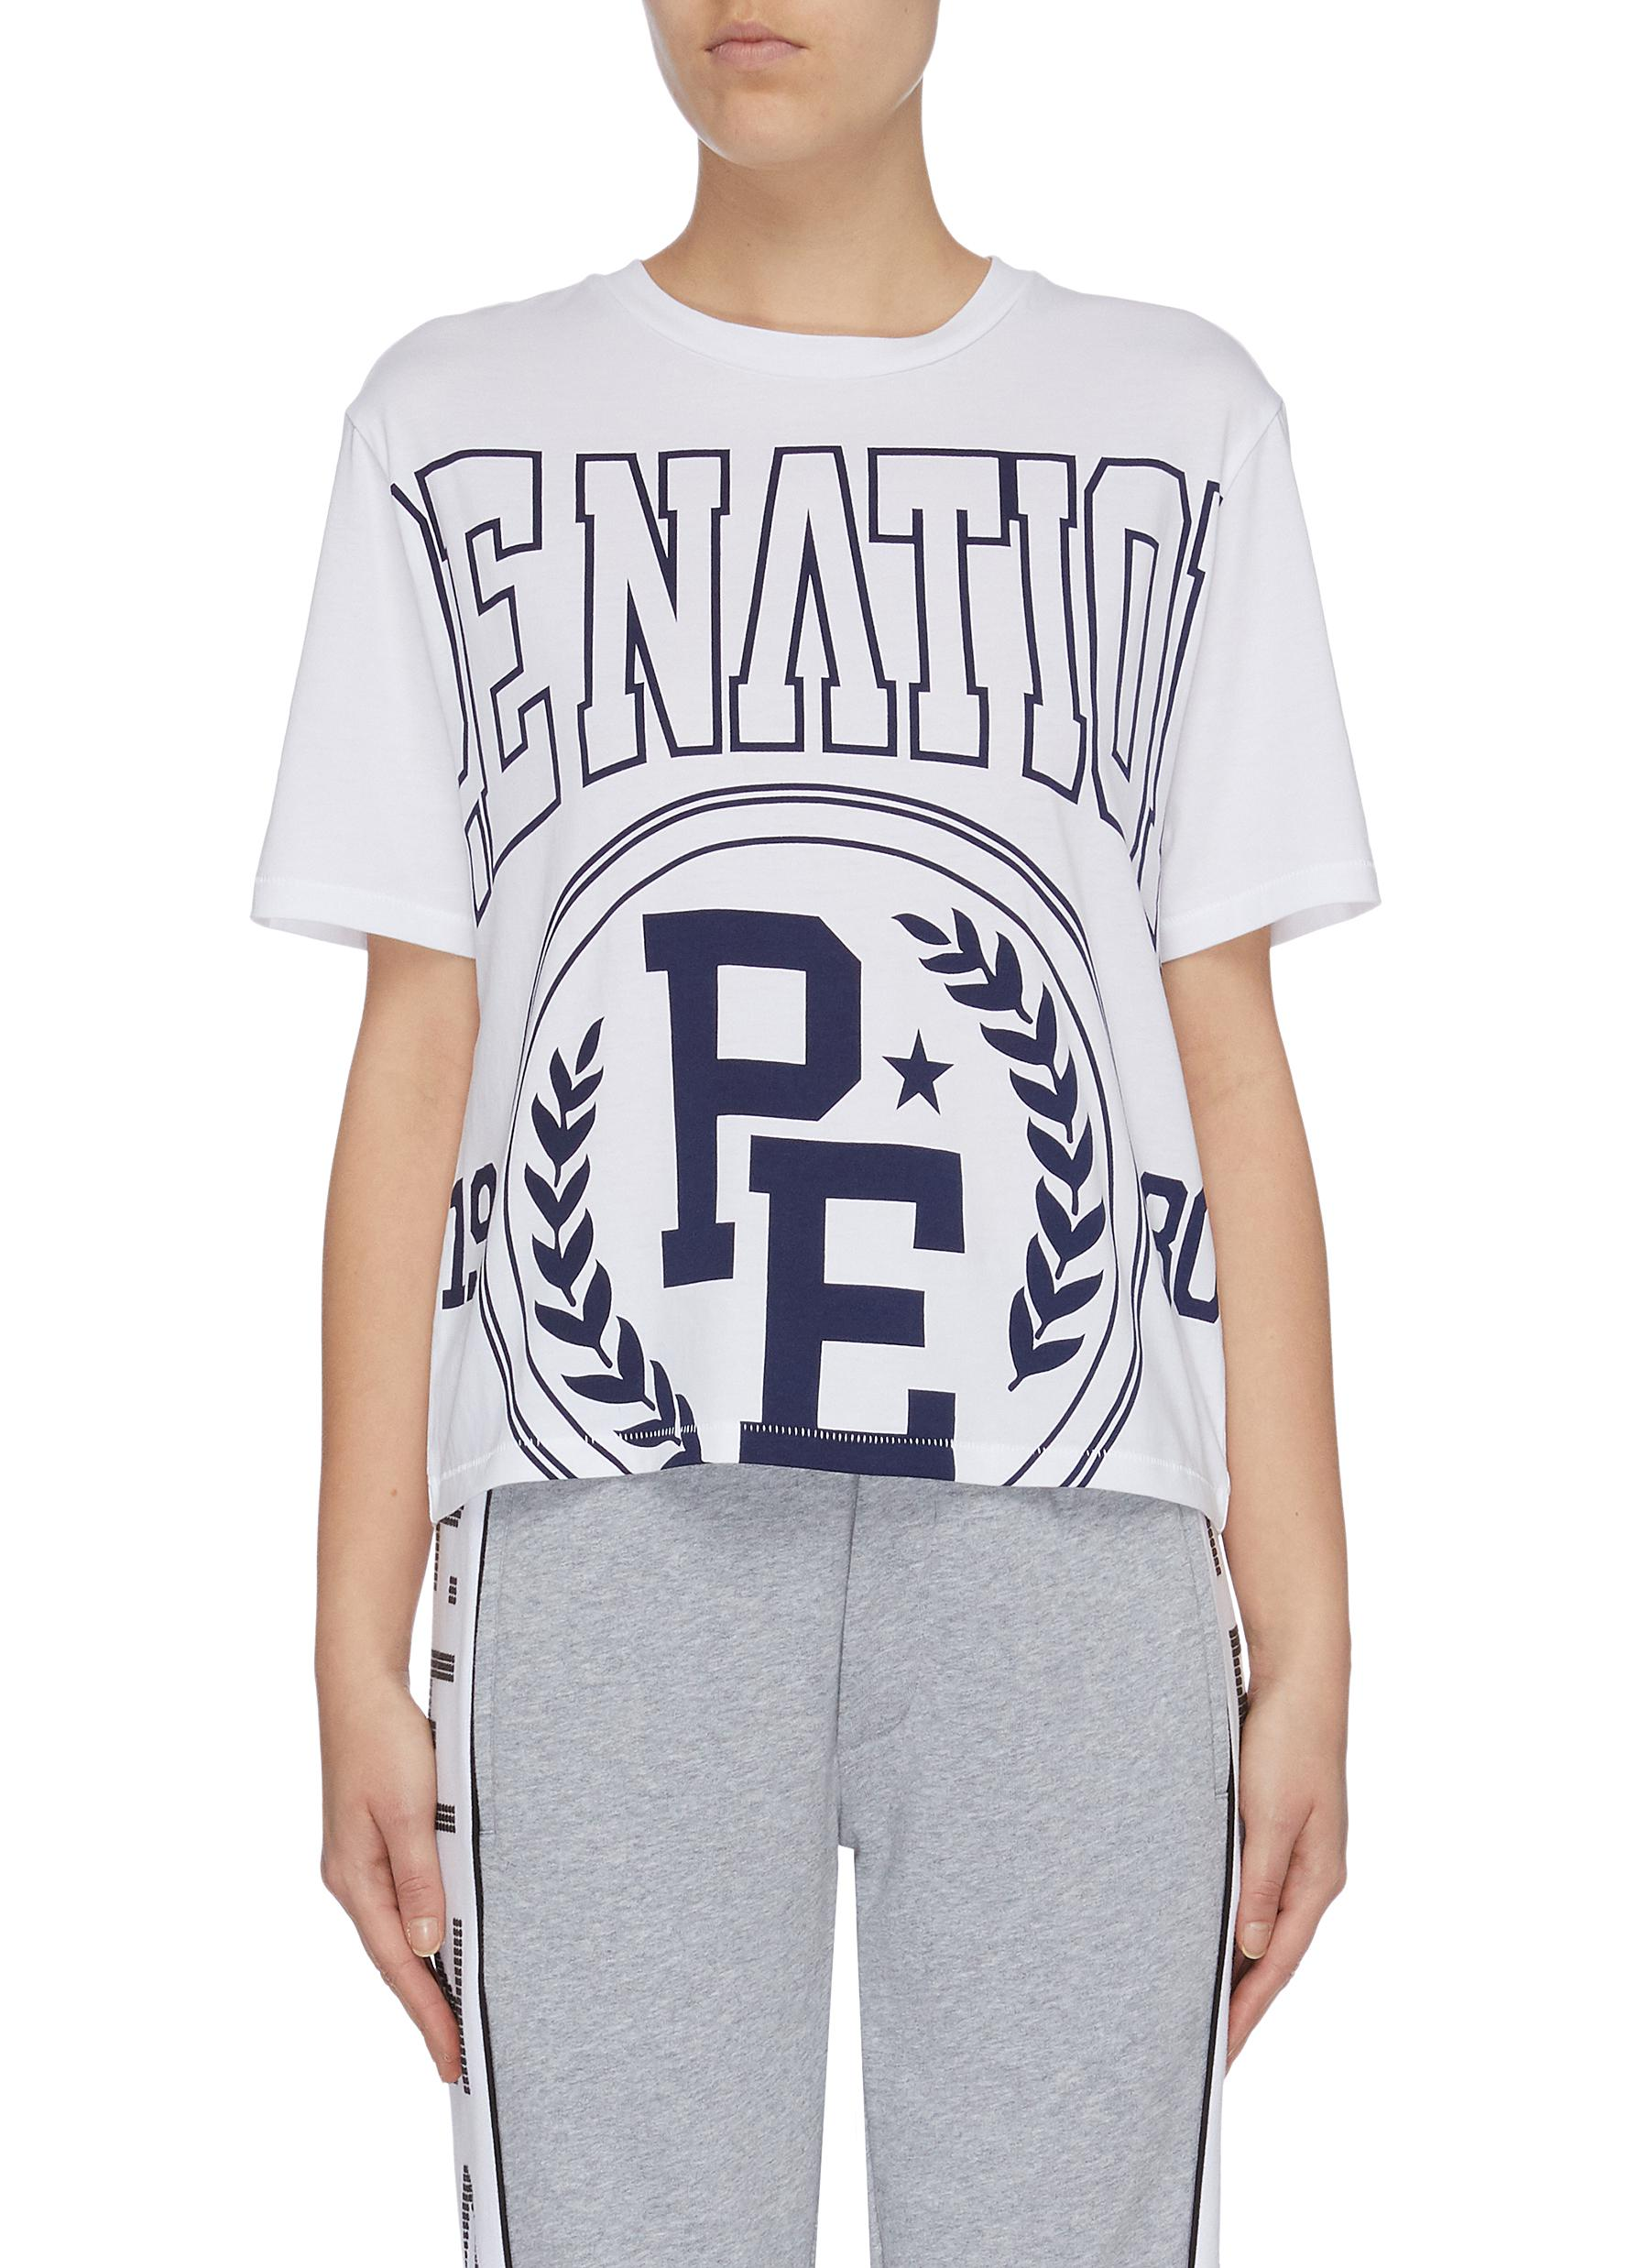 Collegiate Squad logo print T-shirt by P.E Nation